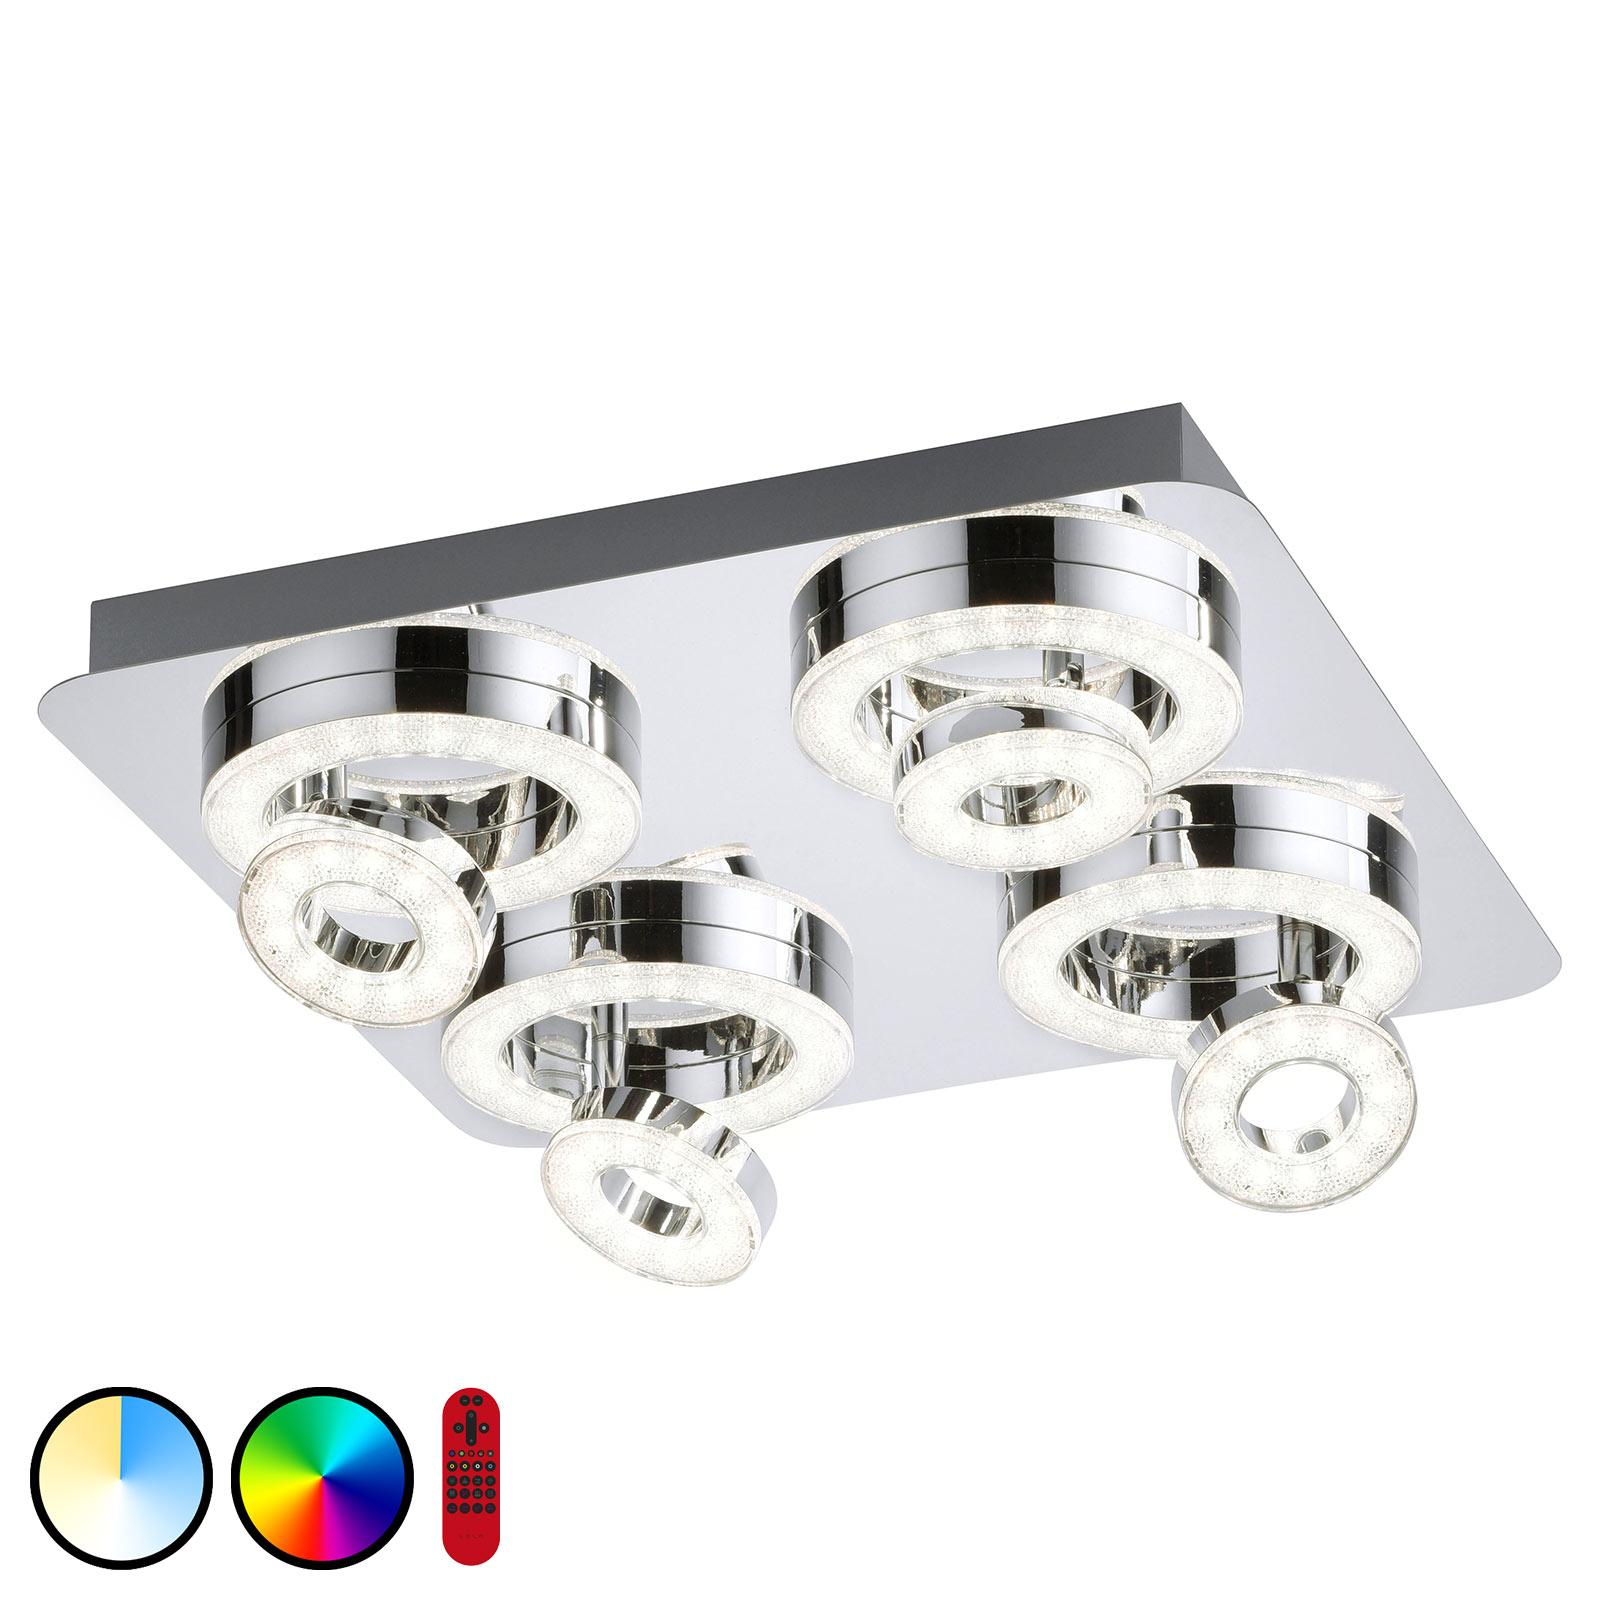 LED plafondlamp LOLAsmart Tim